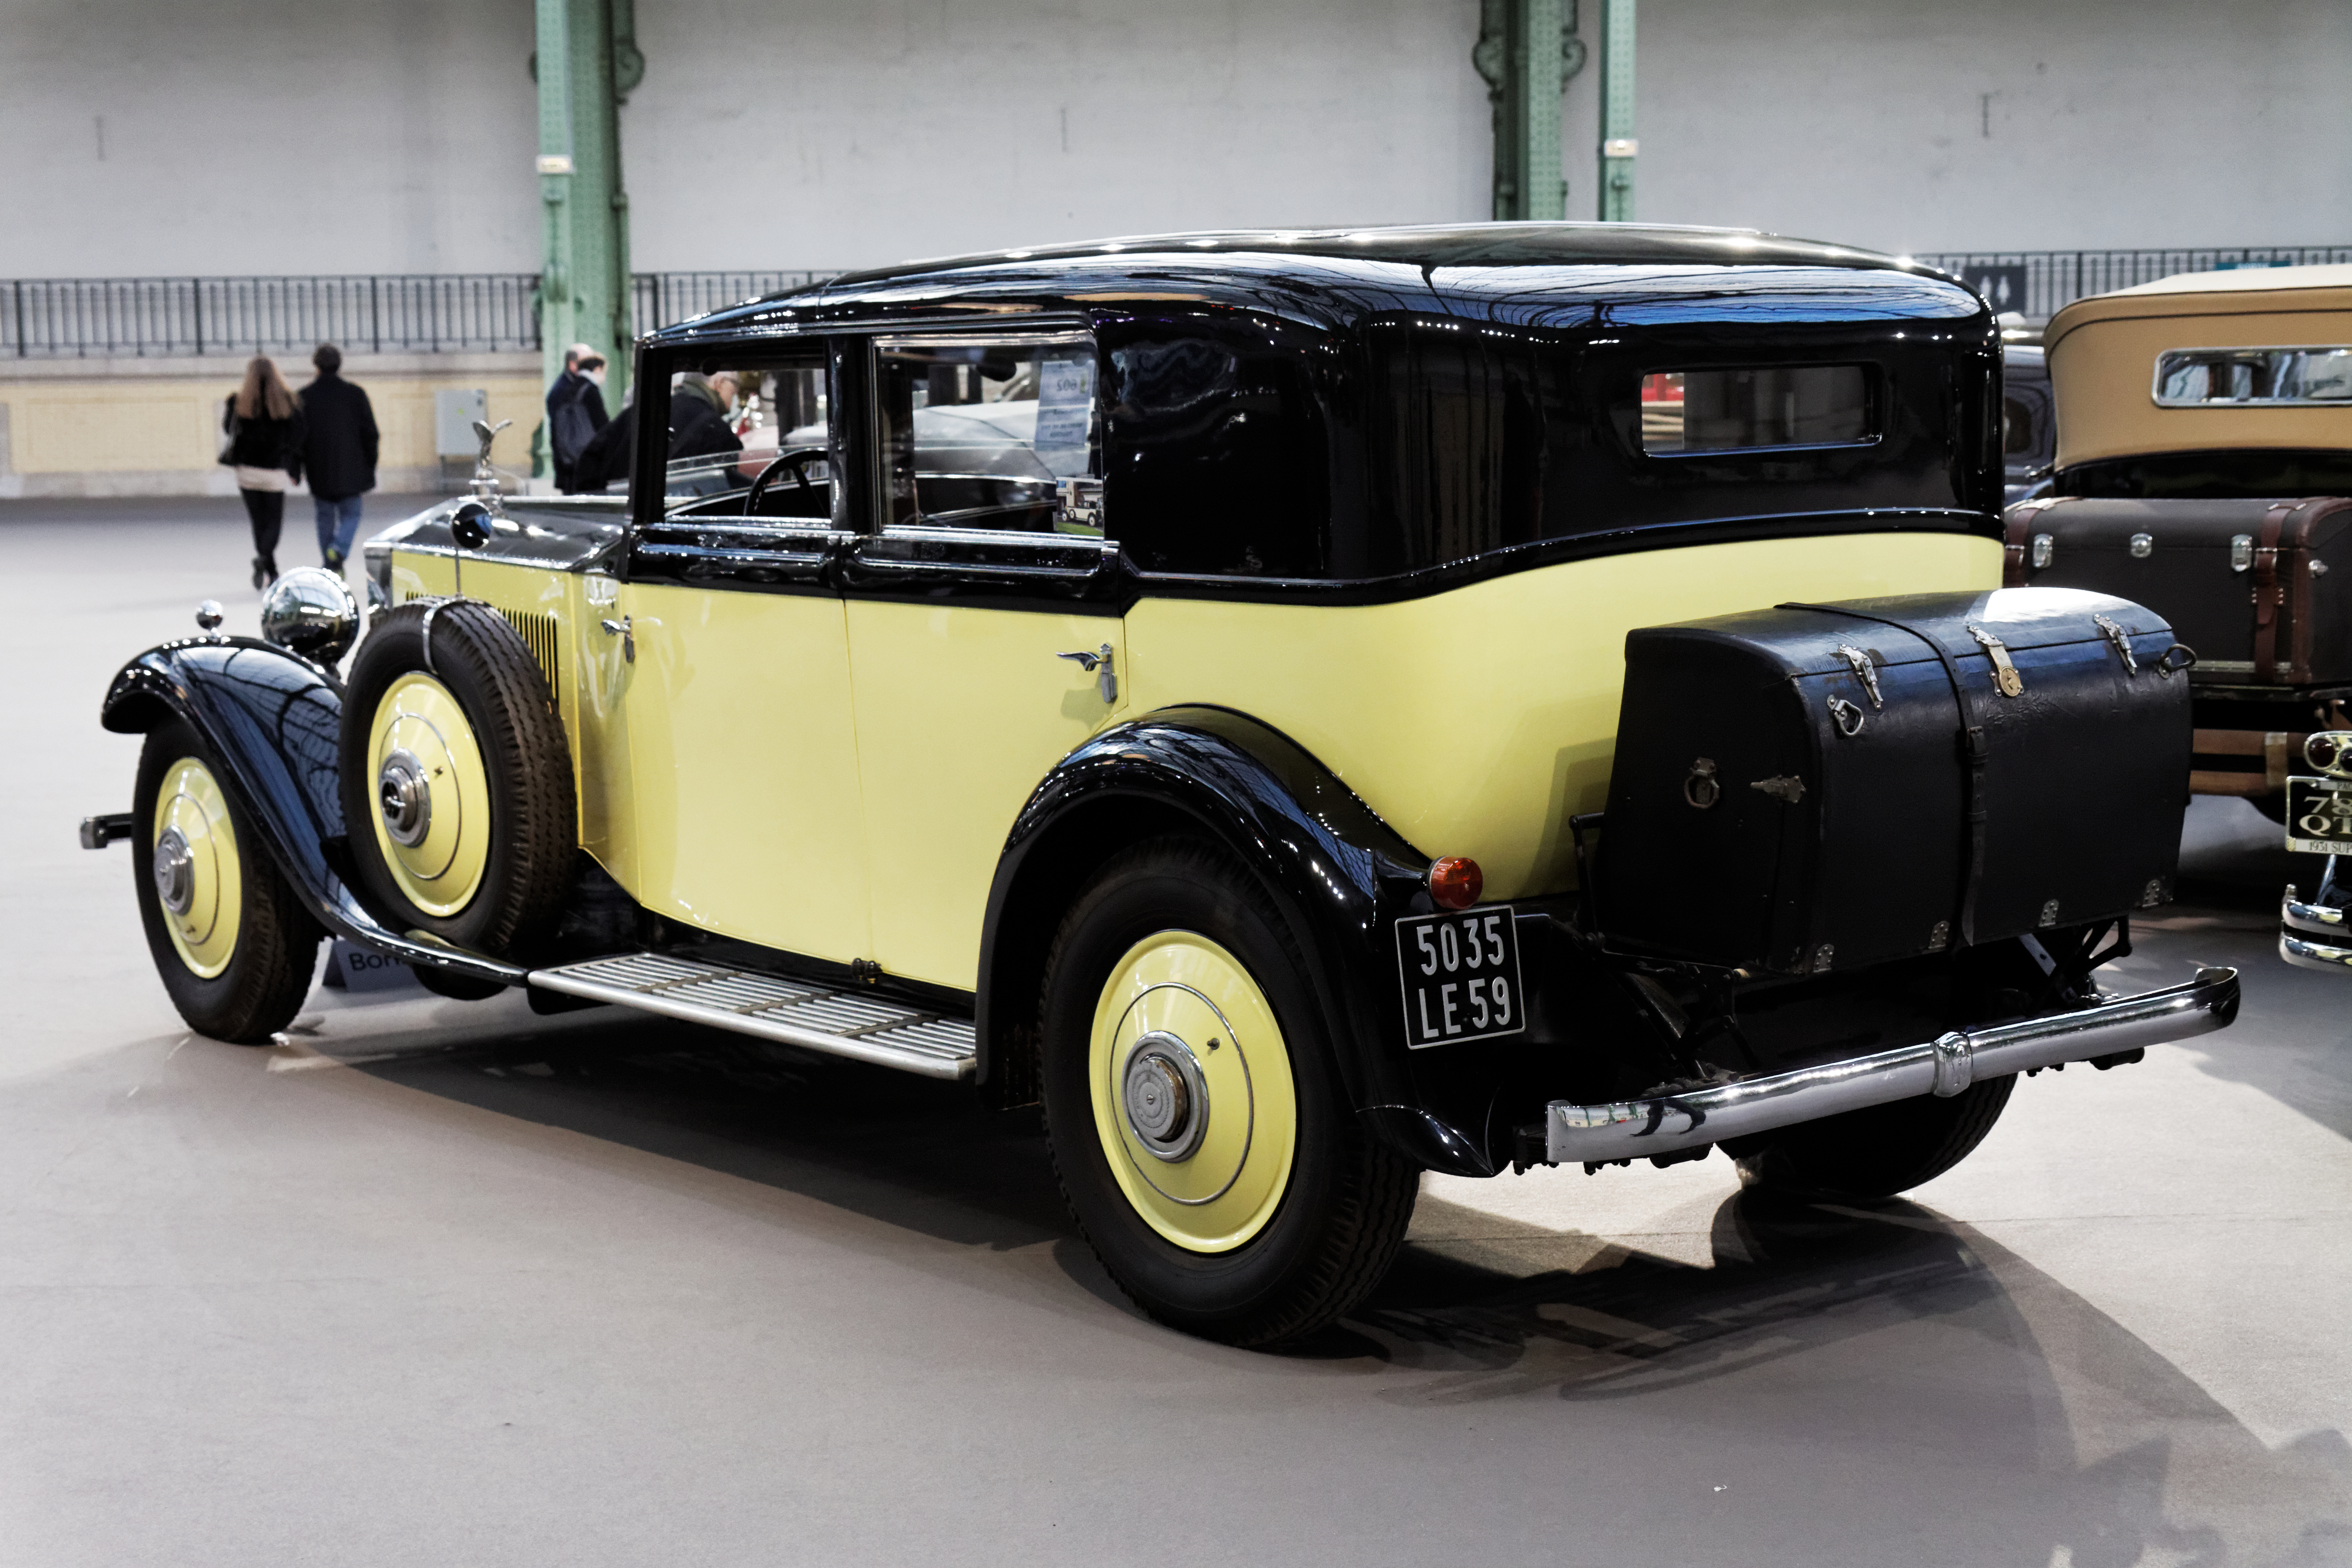 HQ 1929 Rolls-royce Phantom Ii Wallpapers | File 14469.18Kb